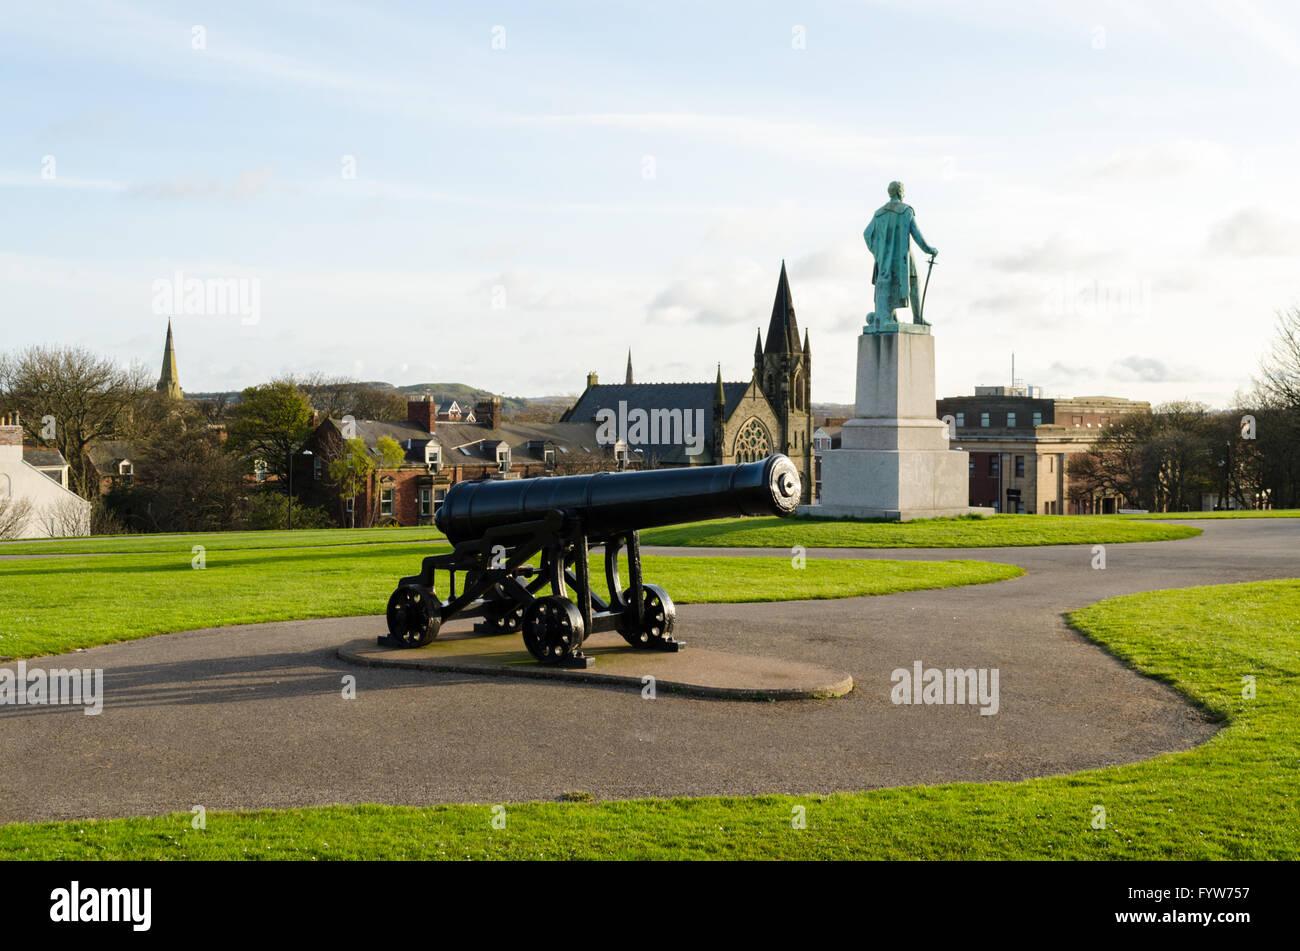 Sebastopol Replica Cannon, located in Mowbray Park, Sunderland, Tyne & Wear - Stock Image